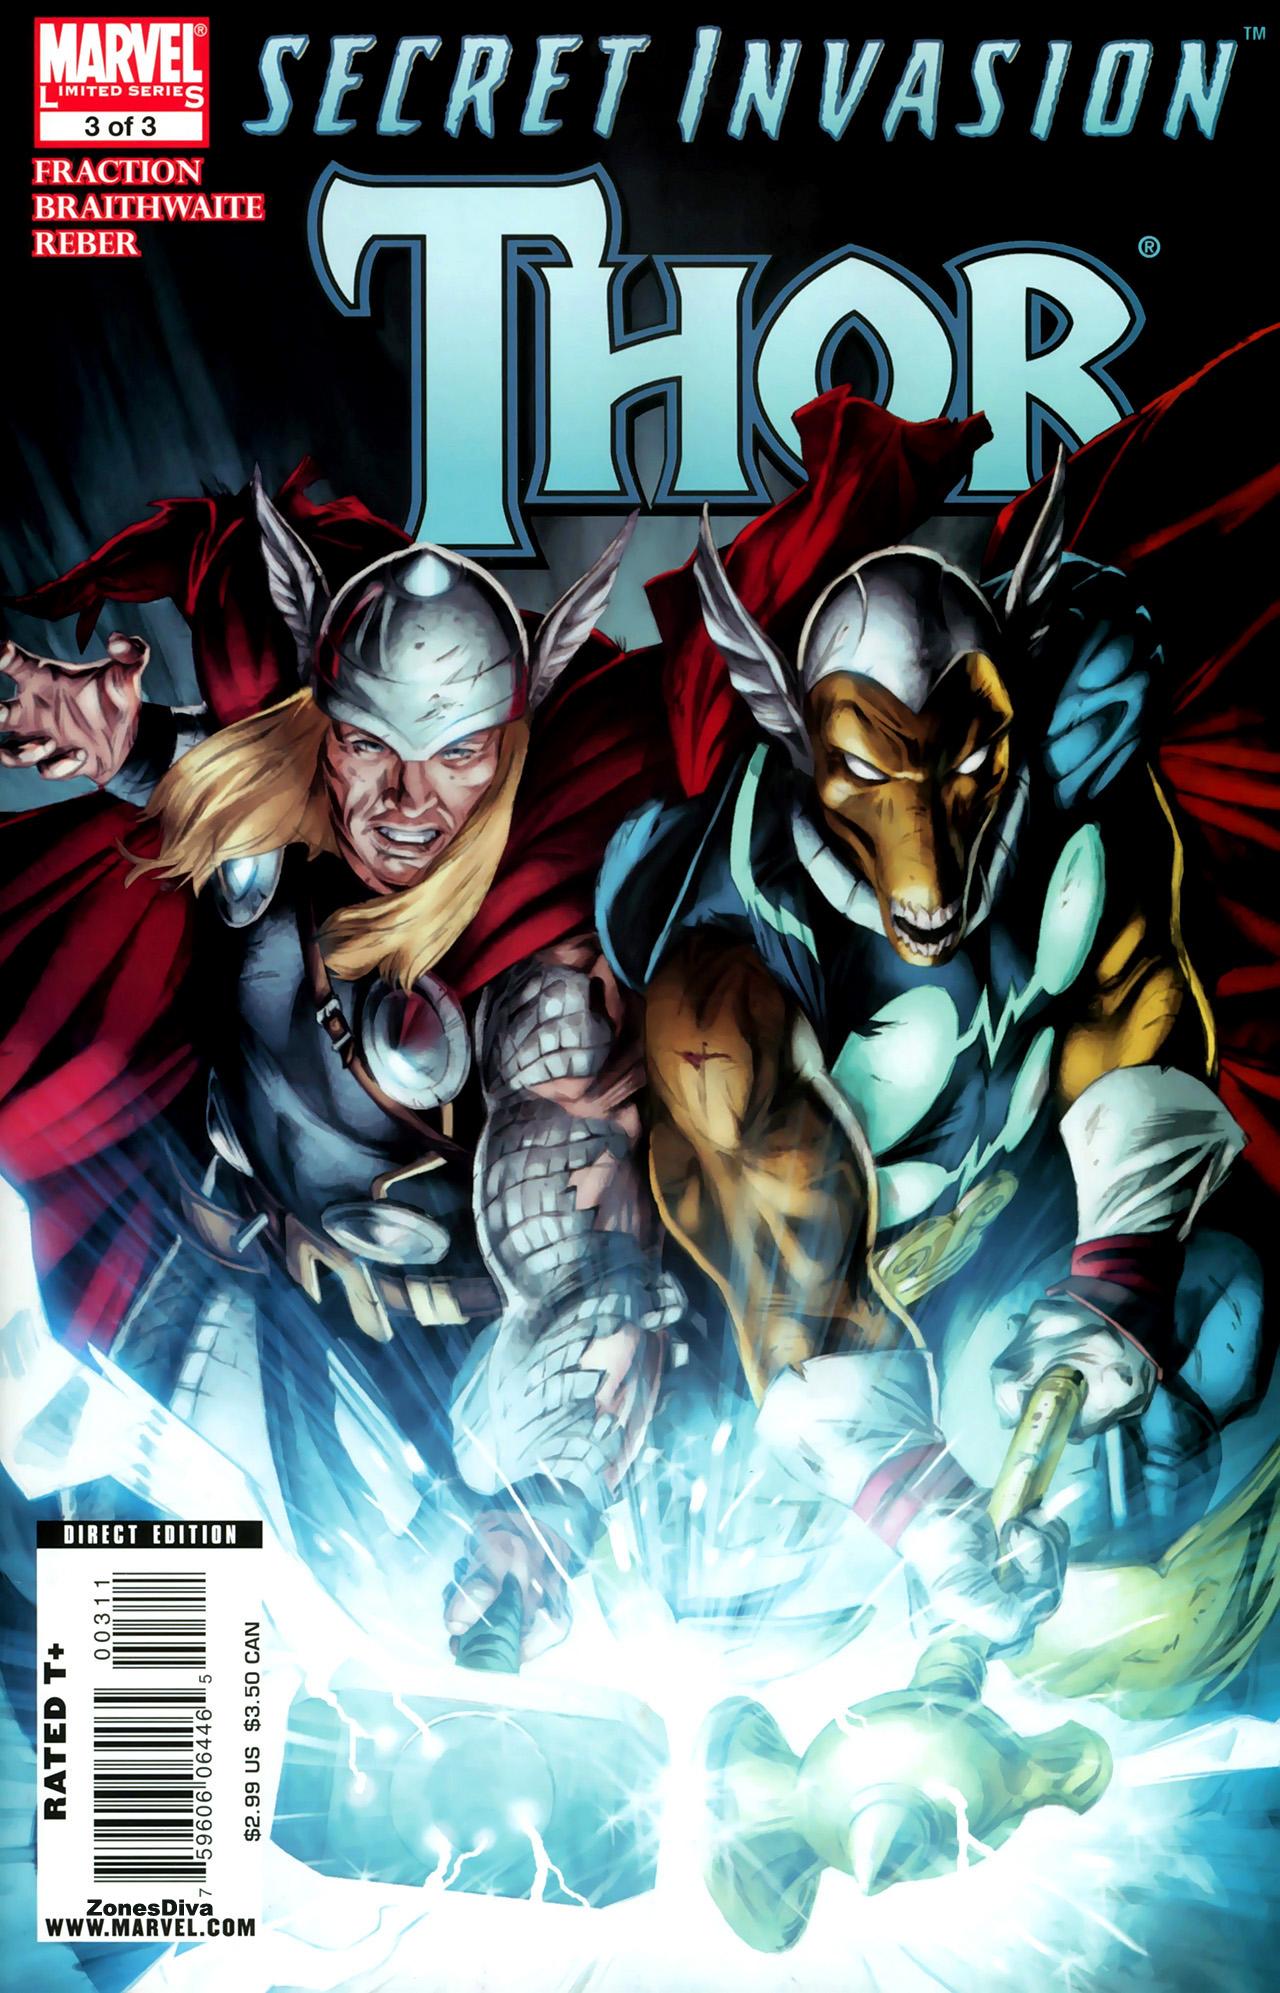 Read online Secret Invasion: Thor comic -  Issue #3 - 1